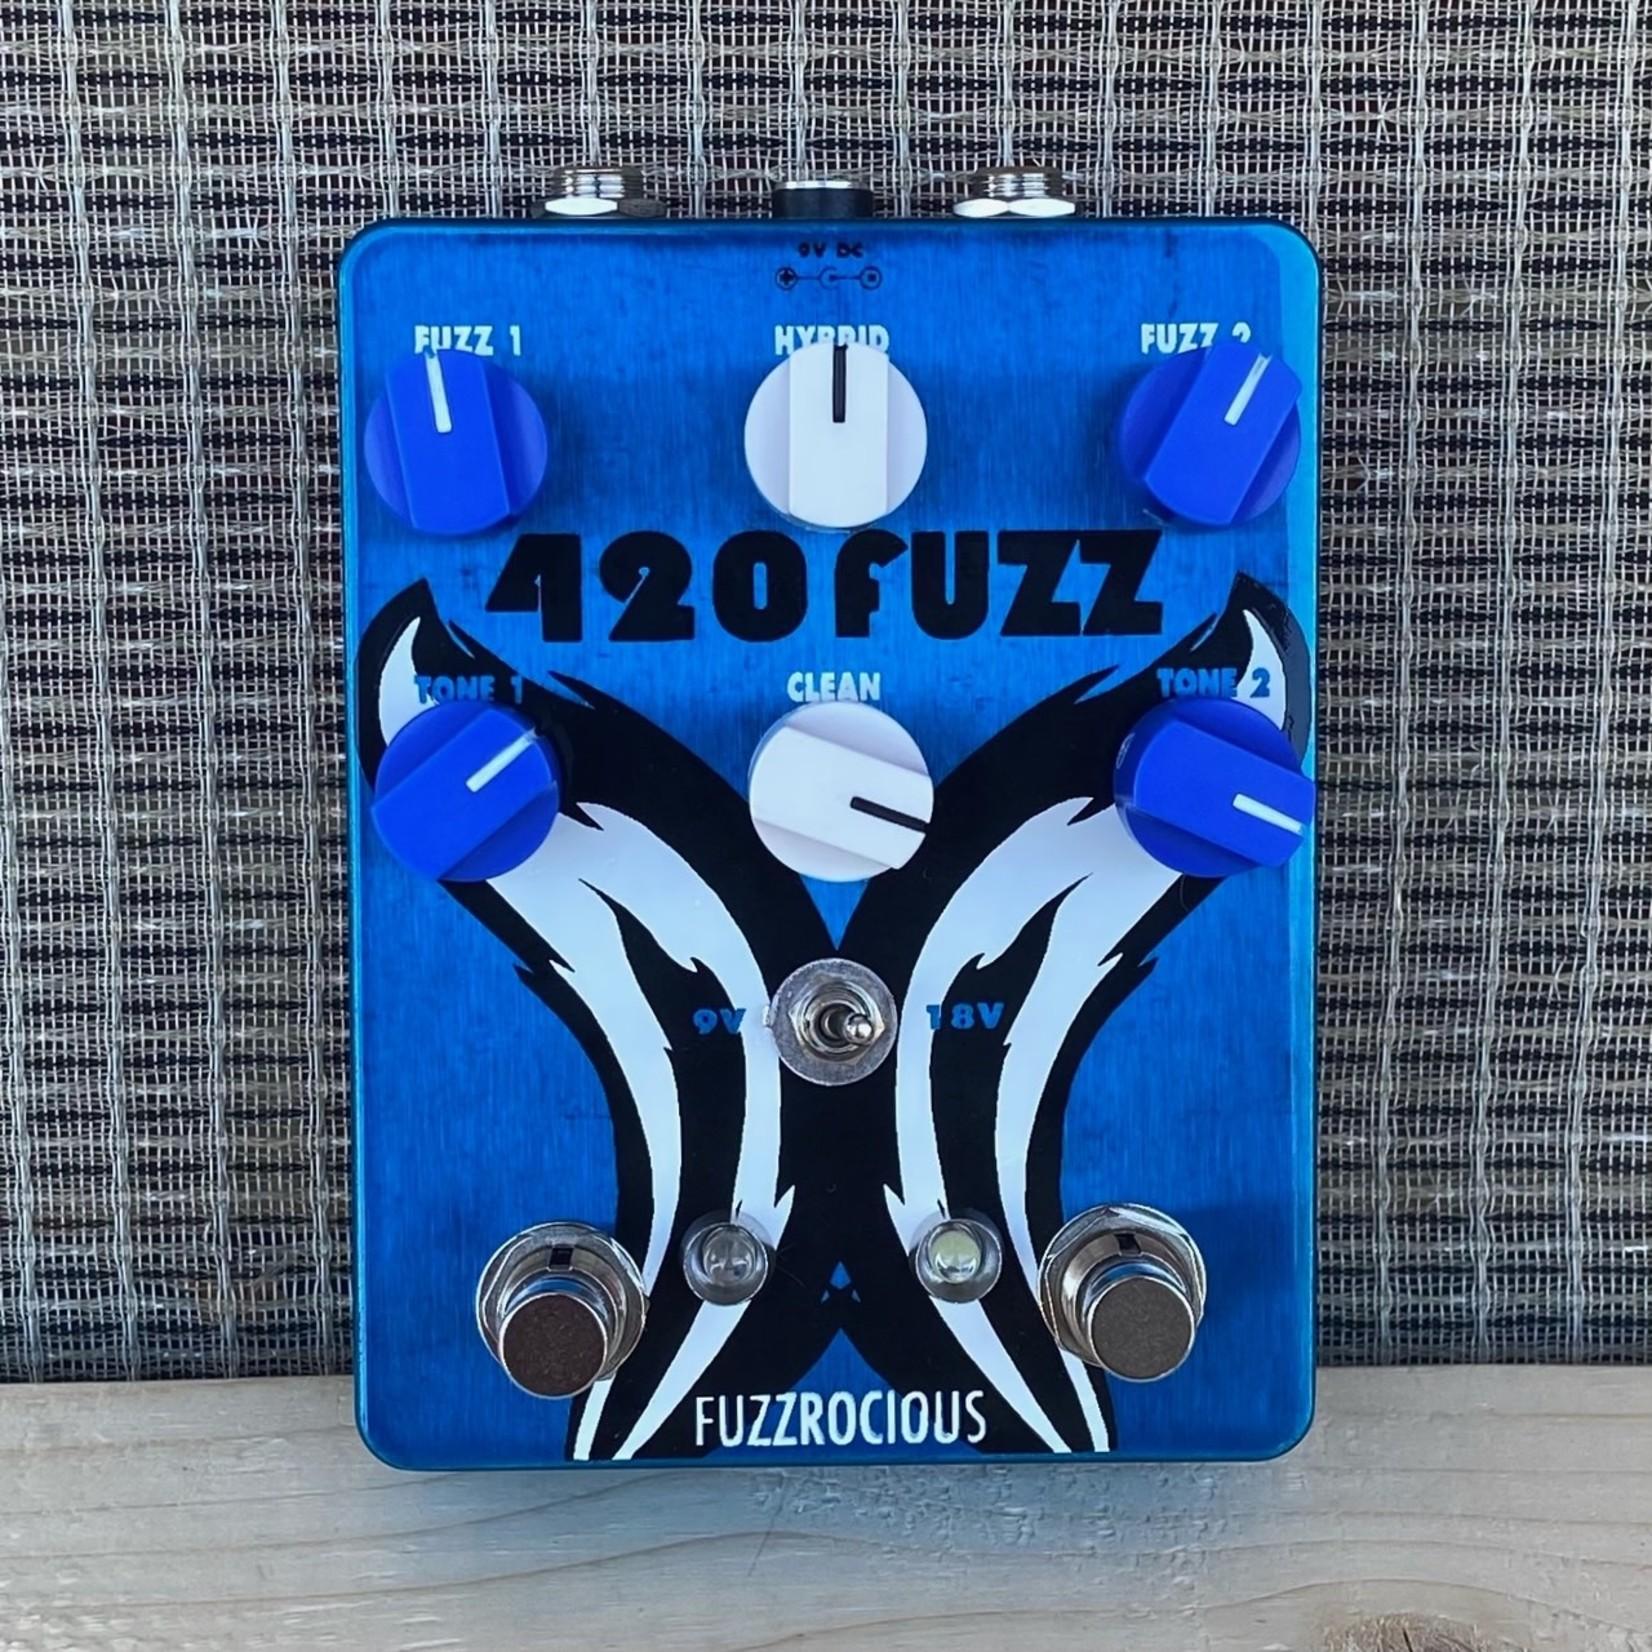 Fuzzrocious Fuzzrocious 420 Fuzz V2